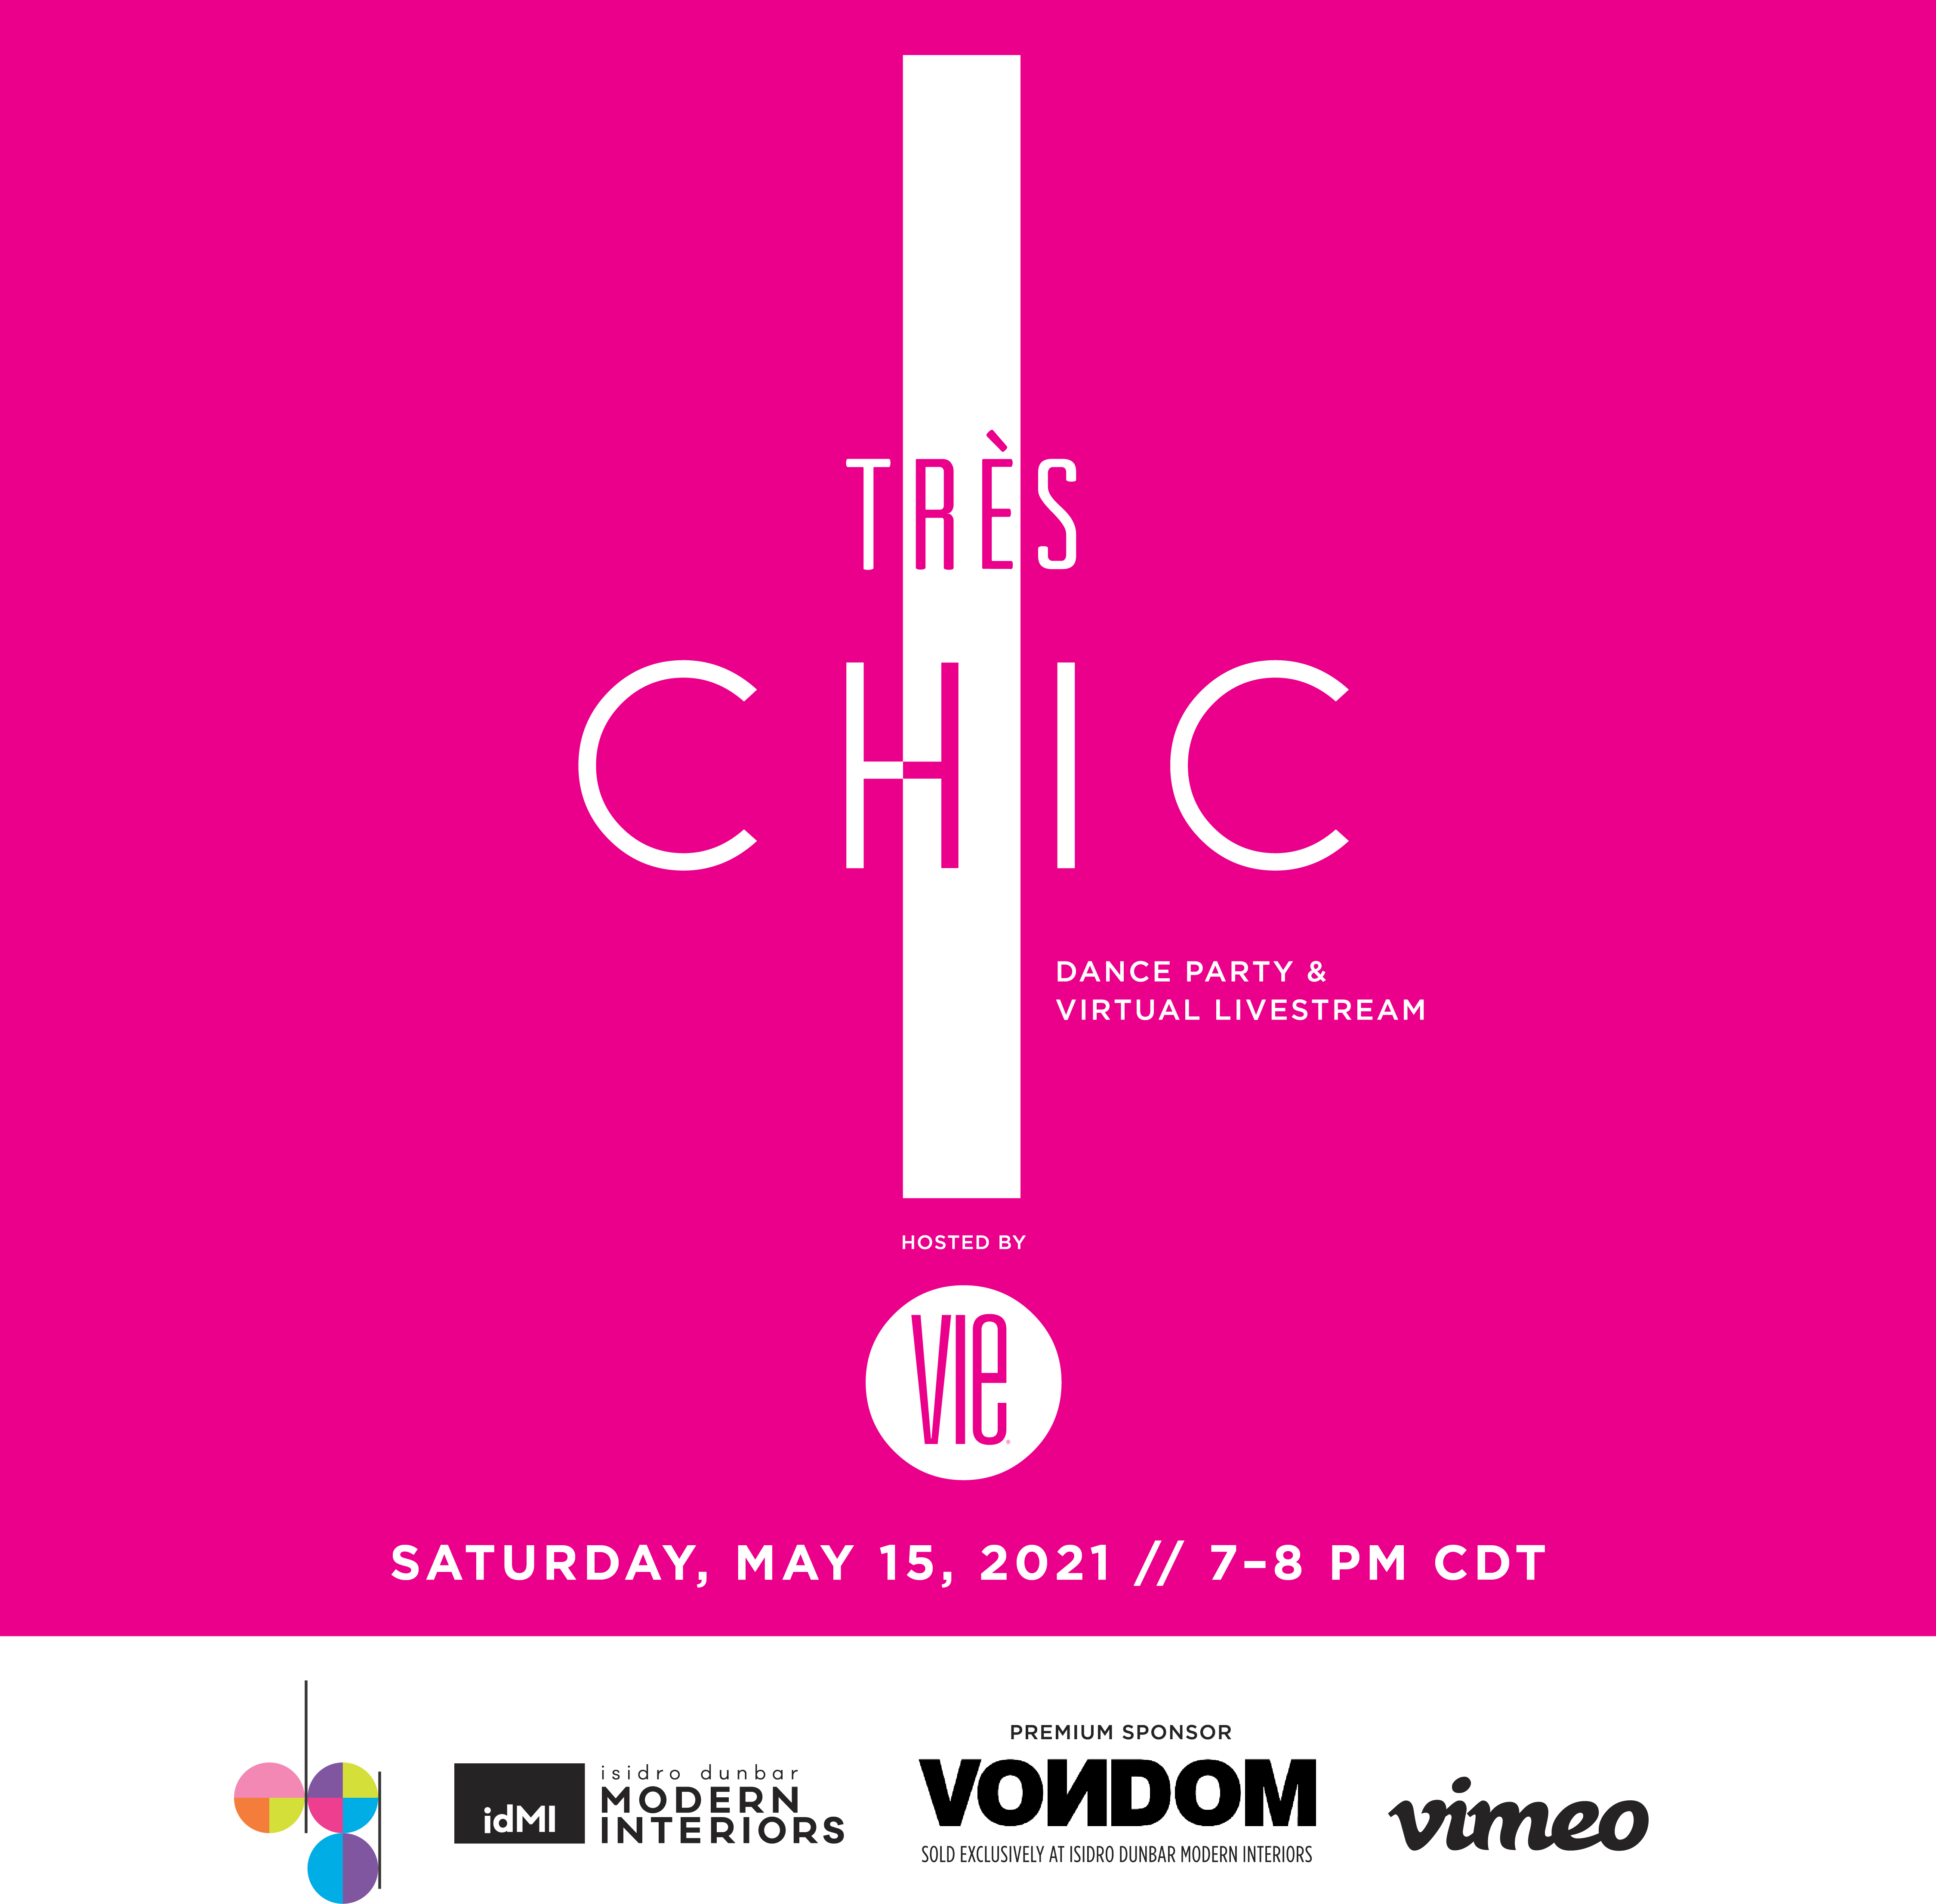 VIE magazine, Digital Graffiti, 2021, Awards Party, Tres Chic Virtual Dance Party